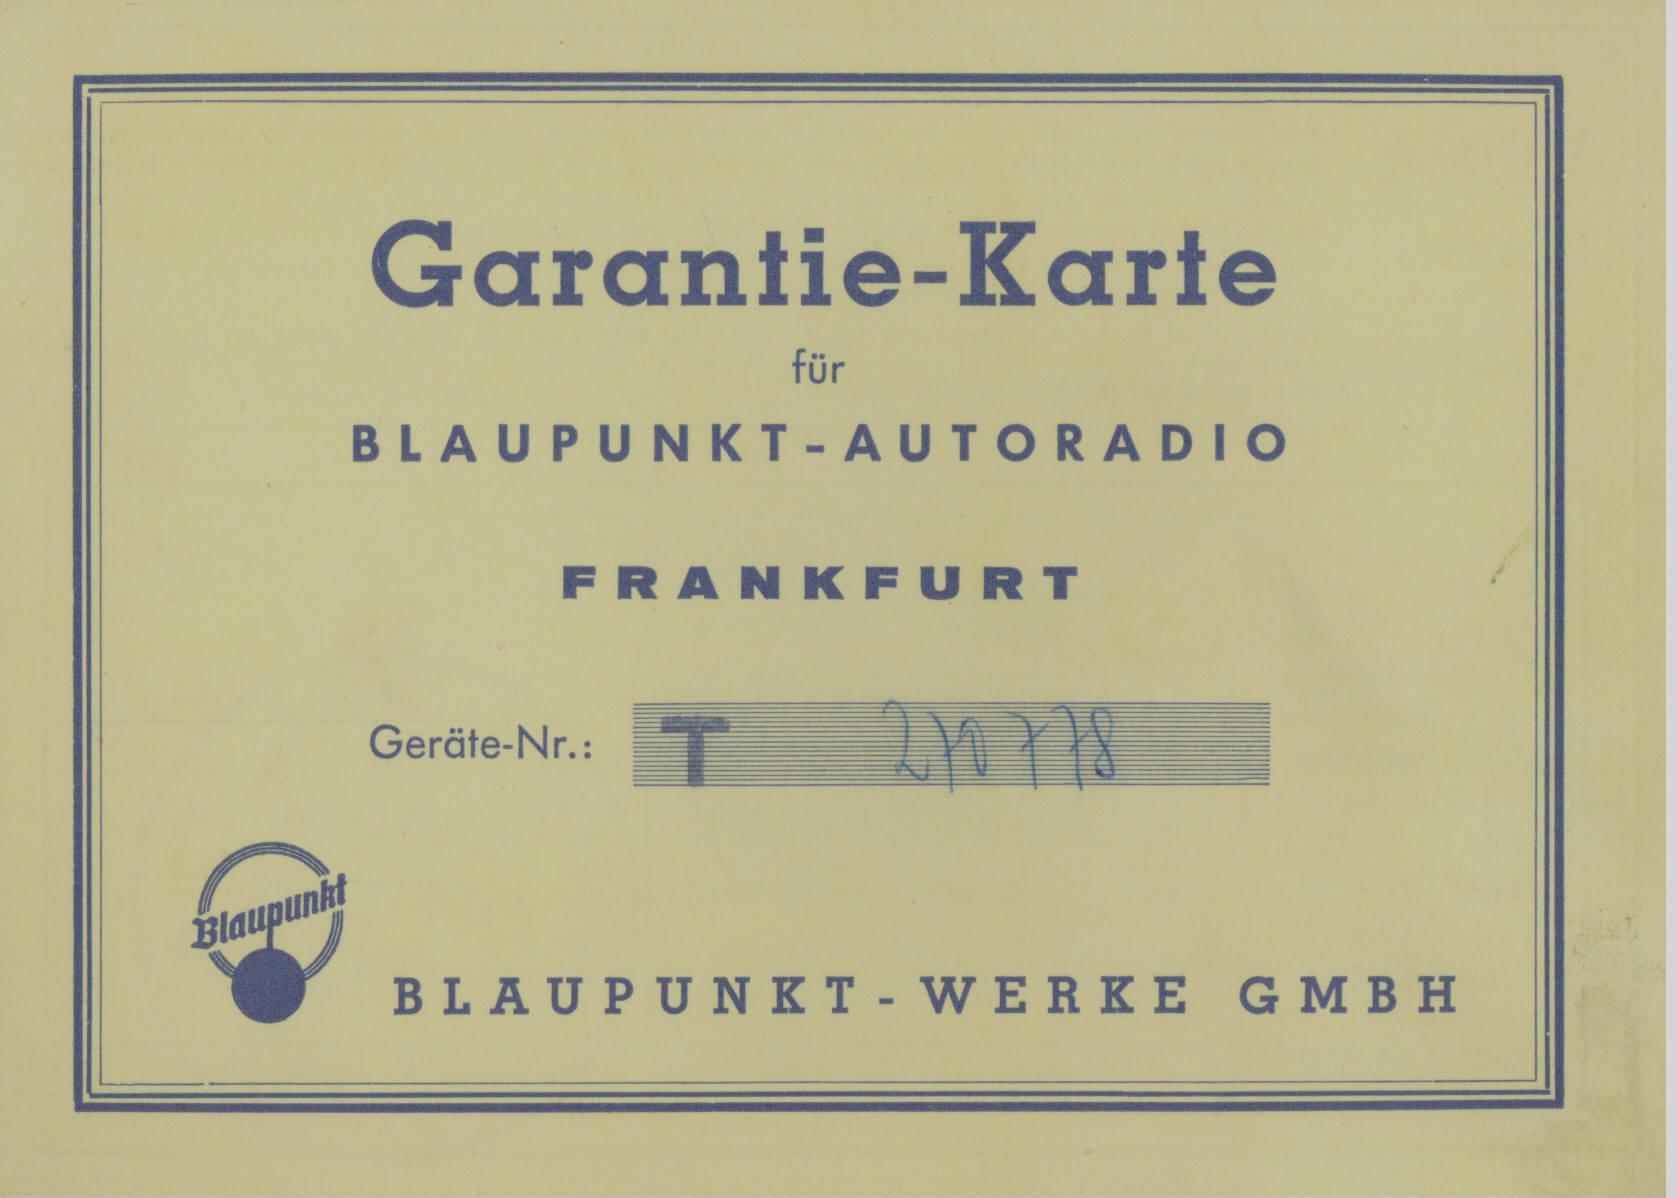 Blaupunkt Auto Radio Warrenty Card